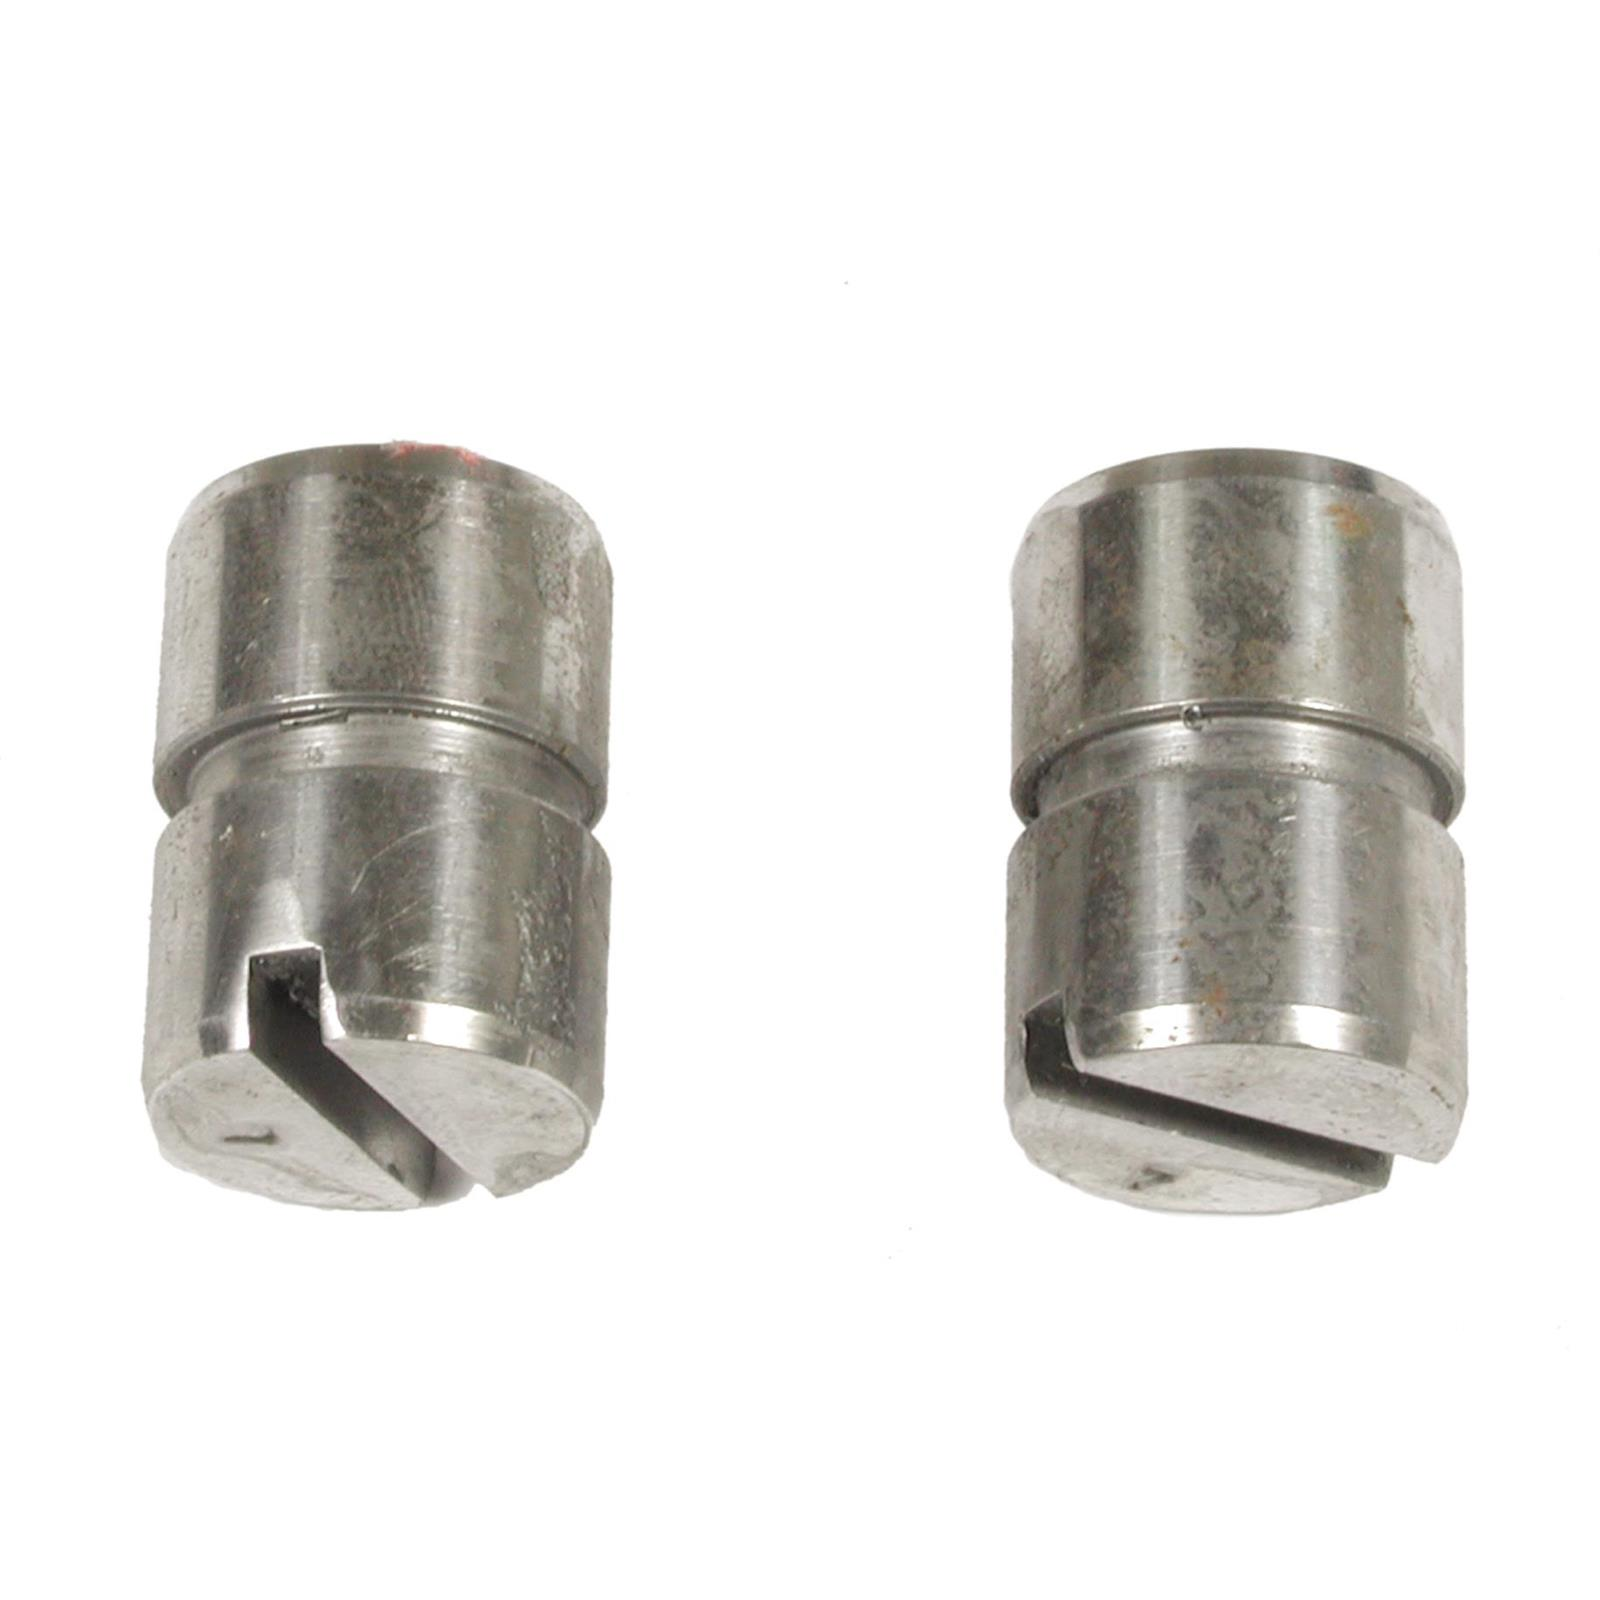 Expansion Freeze Plug Kit Chevy LS Engine Dowel Pins LS2000